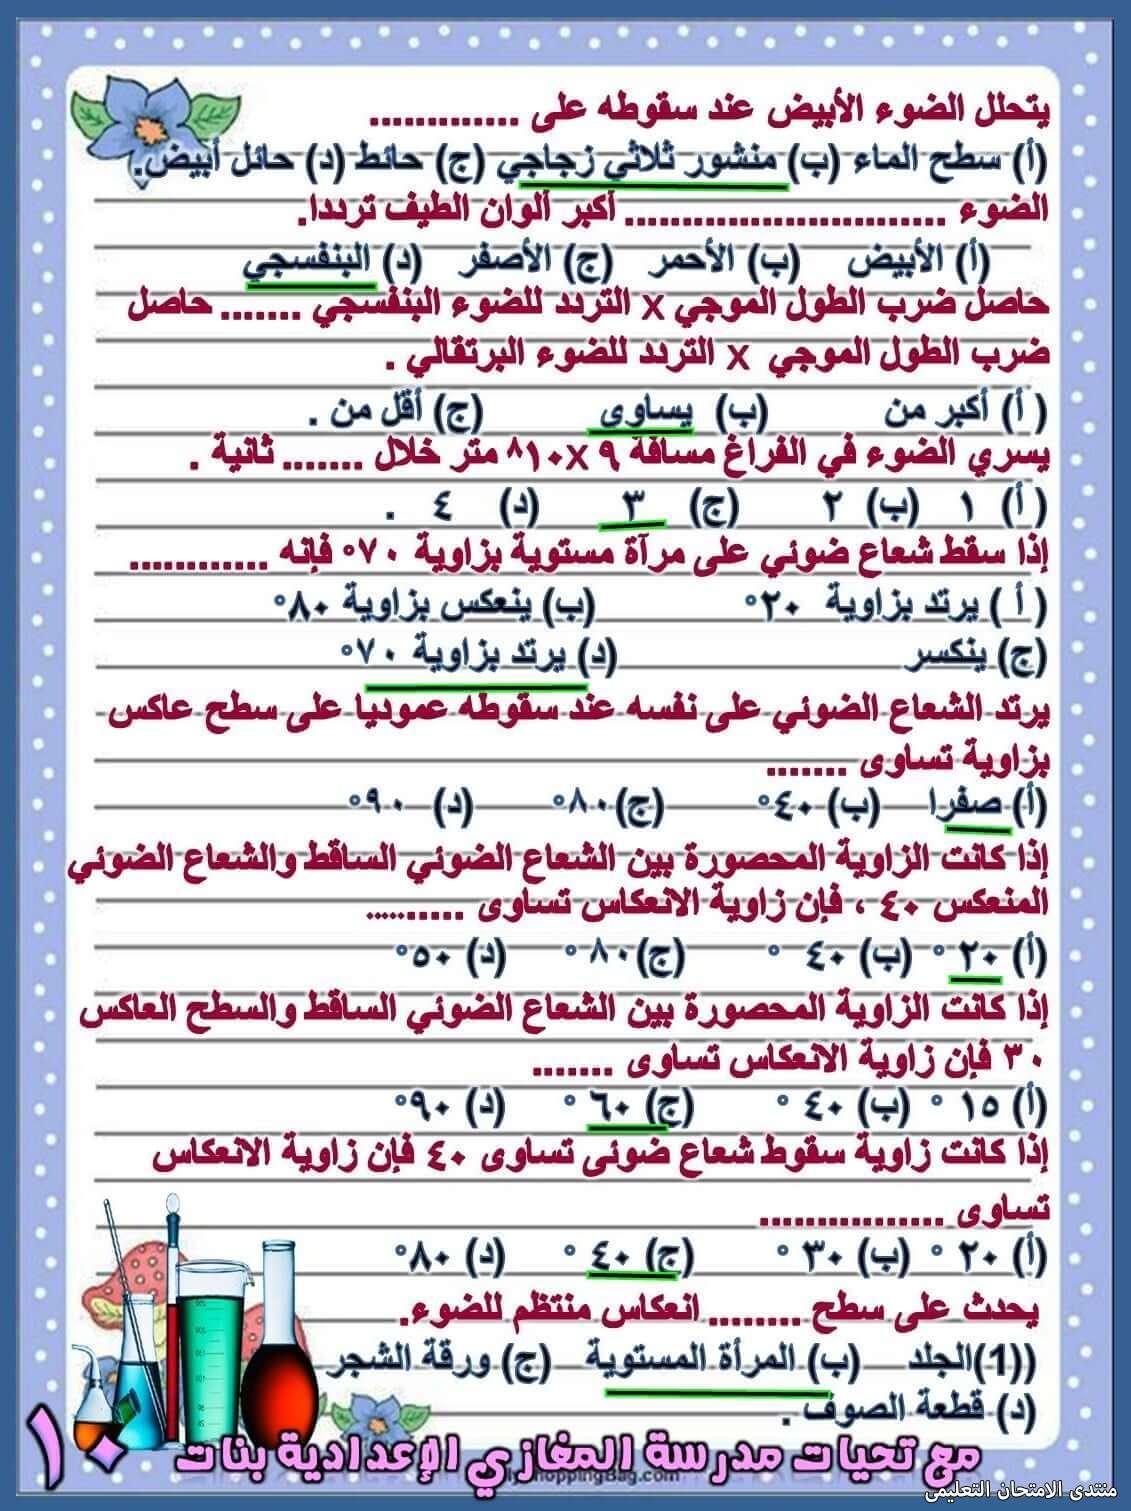 exam-eg.com_161827375082910.jpg